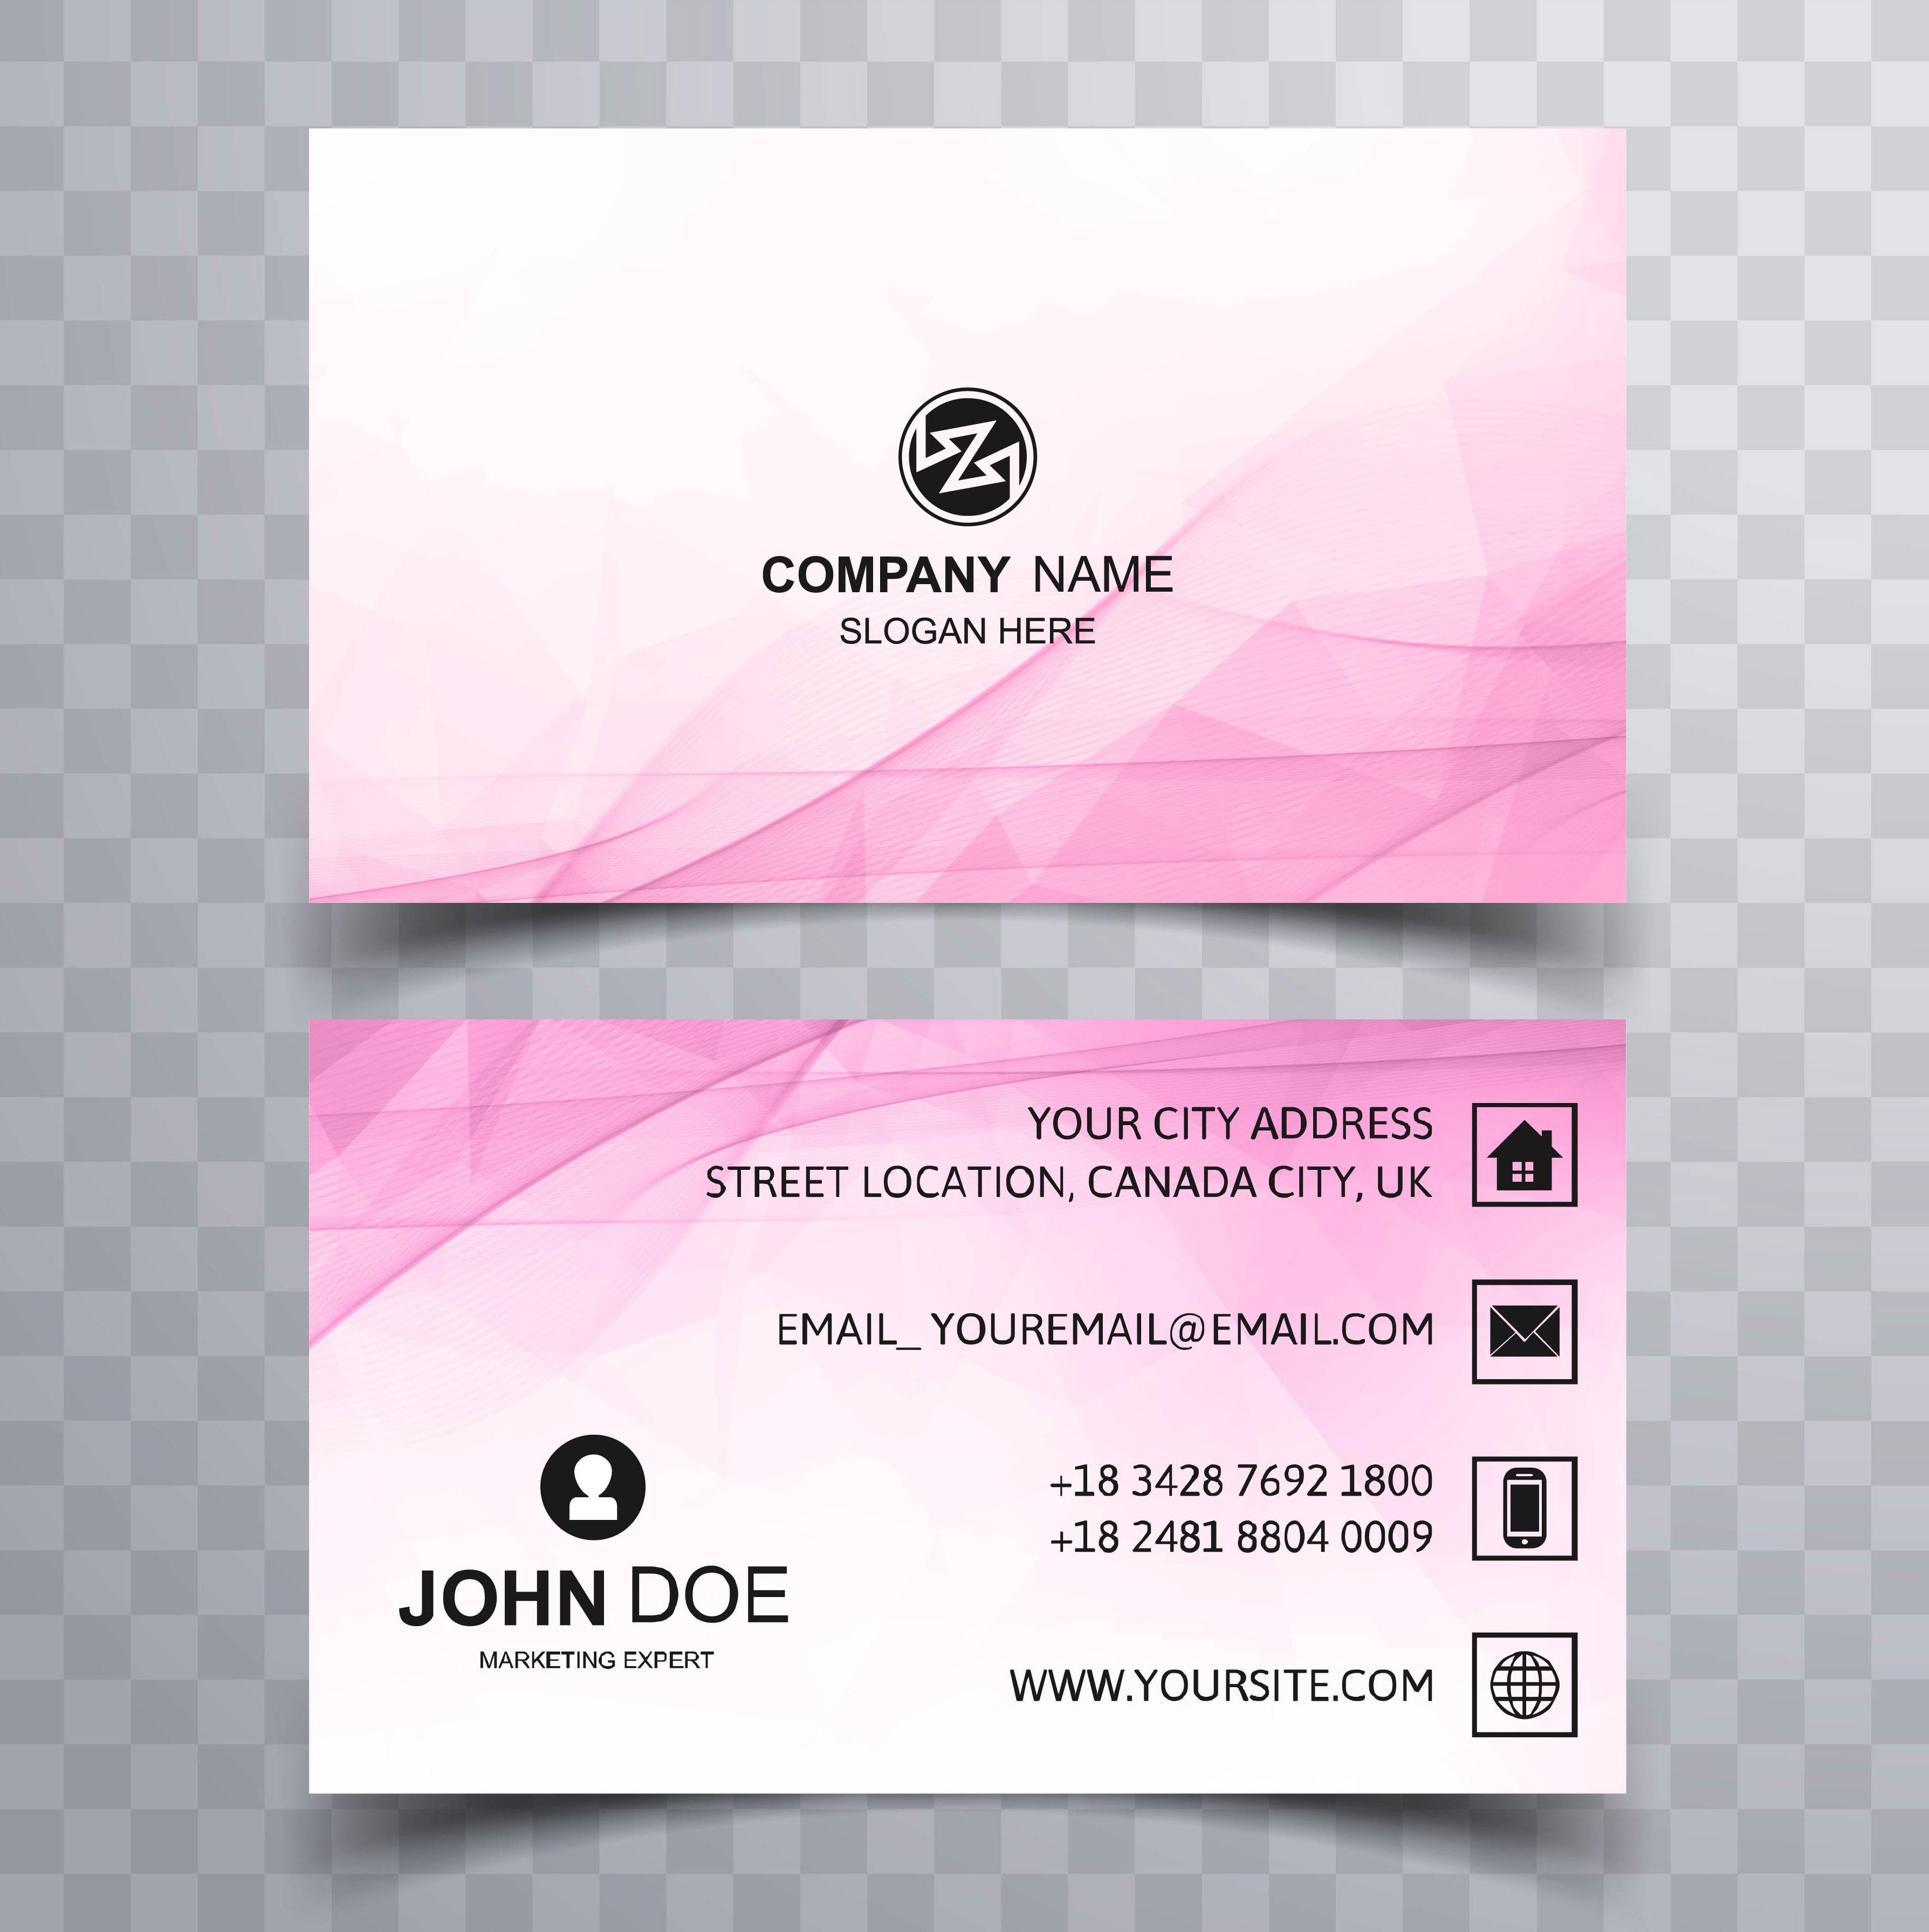 Beautiful colorful business card template design download gratis beautiful colorful business card template design download gratis vectorkunst en andere vectorafbeeldingen wajeb Gallery